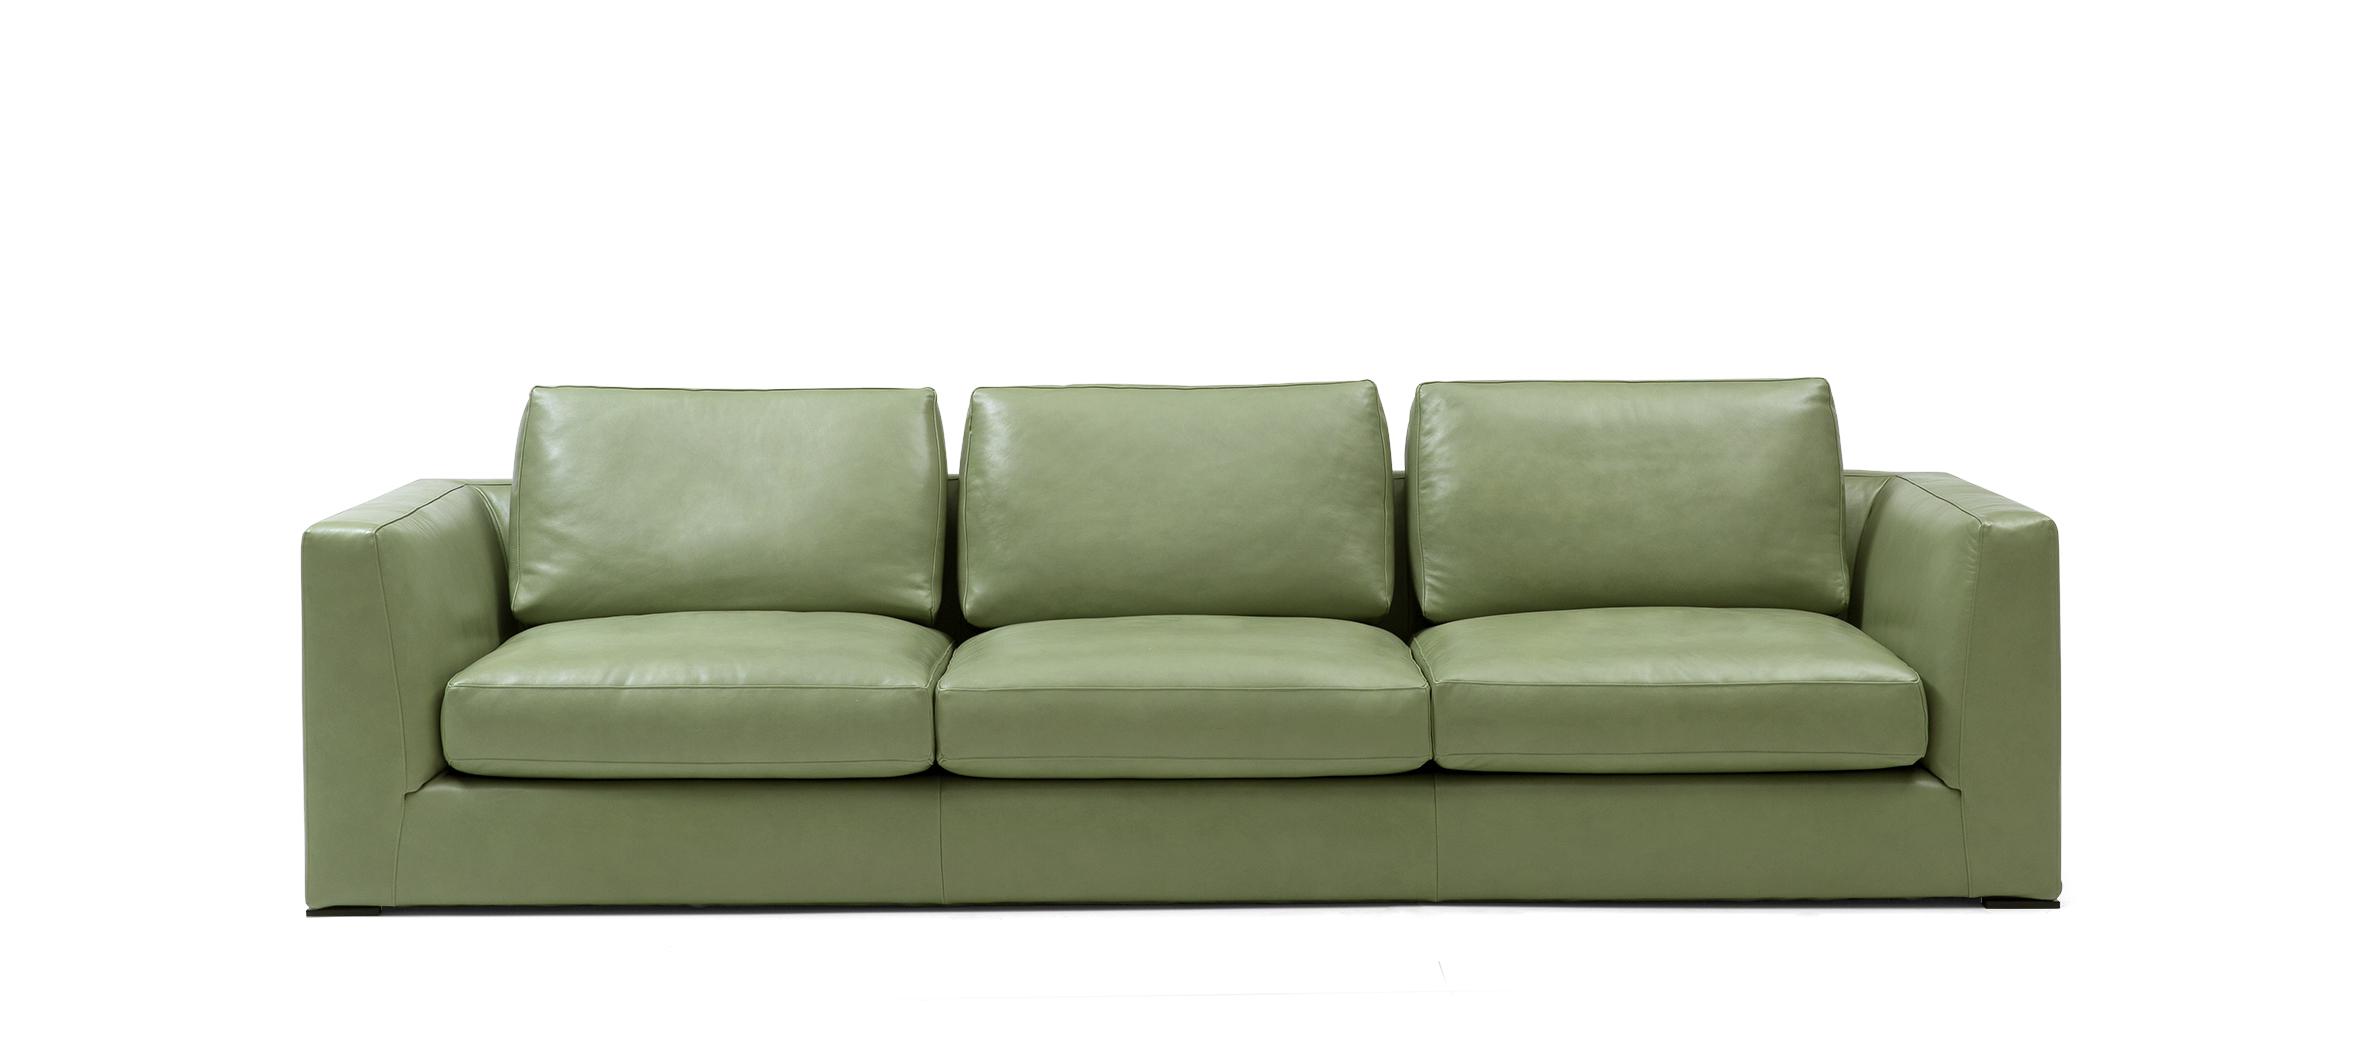 SOF 202 Modern Italian Sofa